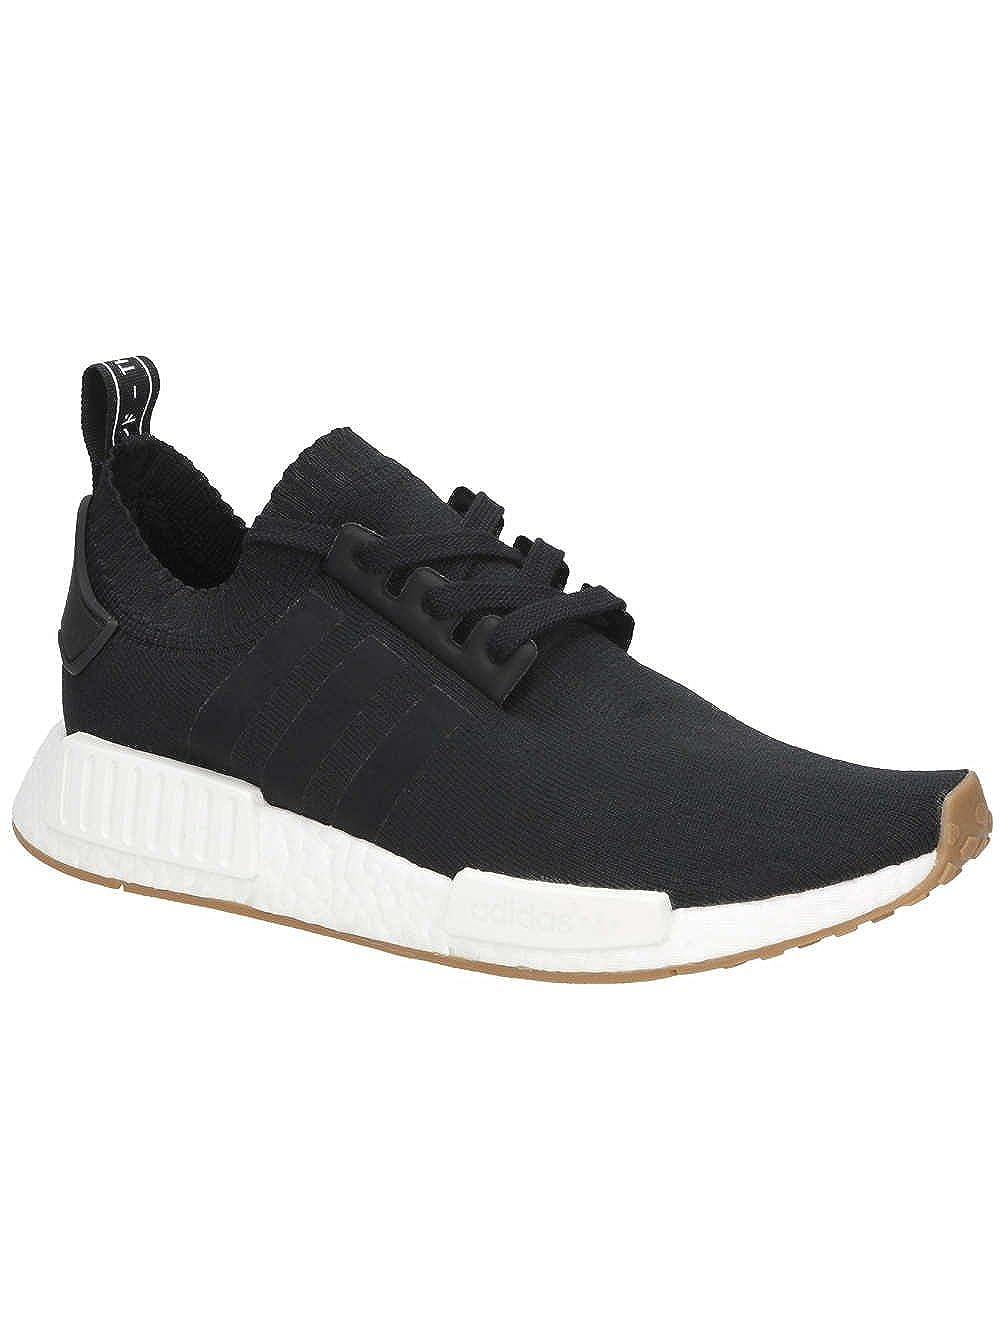 new product c8e63 499ab adidas NMD R1 PK 887 Pack, Zapatillas Unisex Adulto, Negro (Core BlackGum  By1887), 46 23 EU Amazon.es Zapatos y complementos